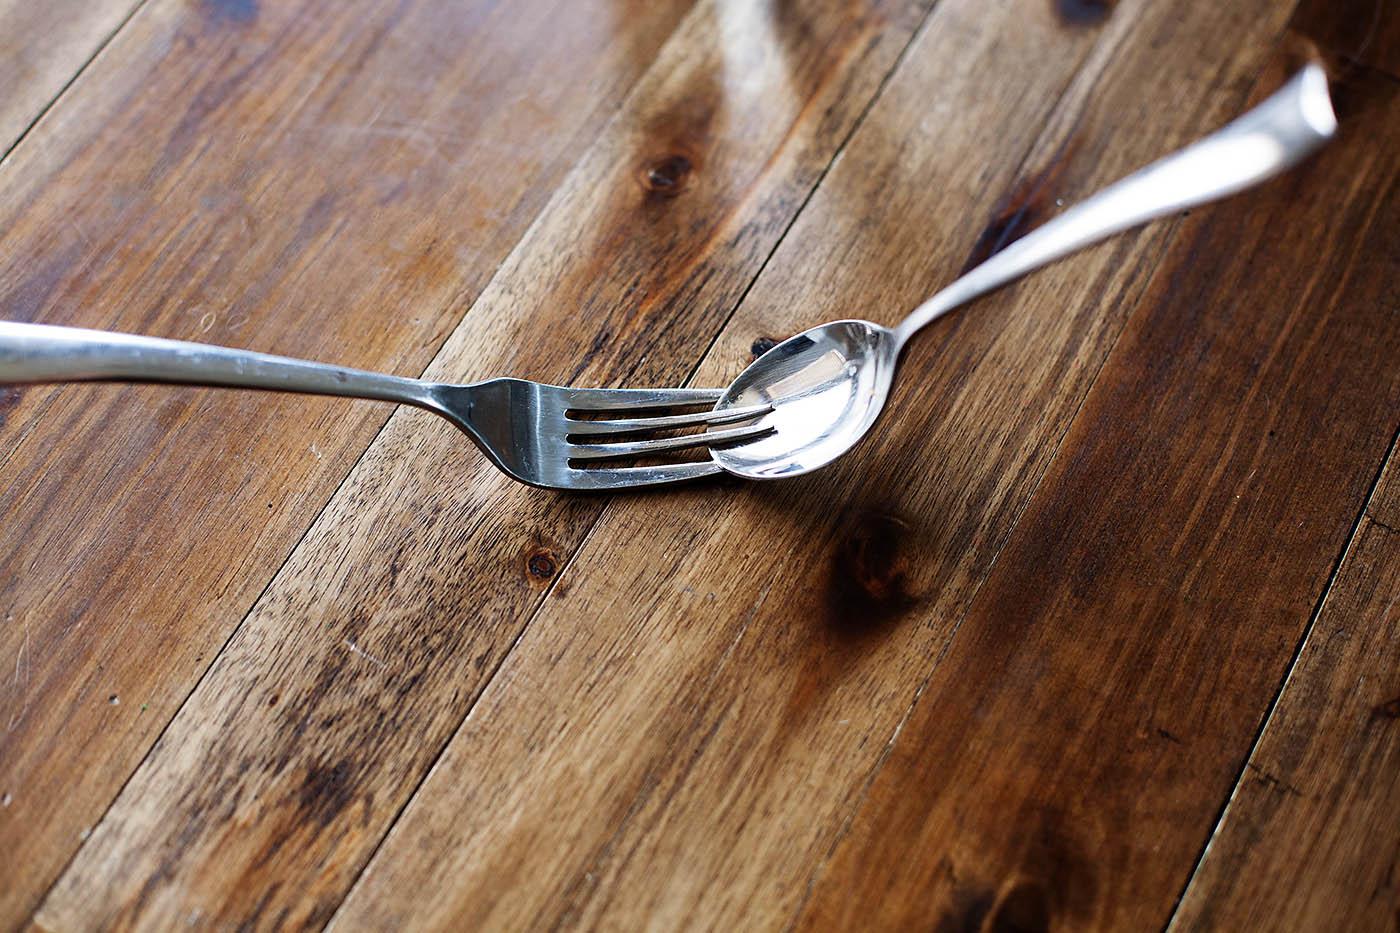 Toothpick balance trick